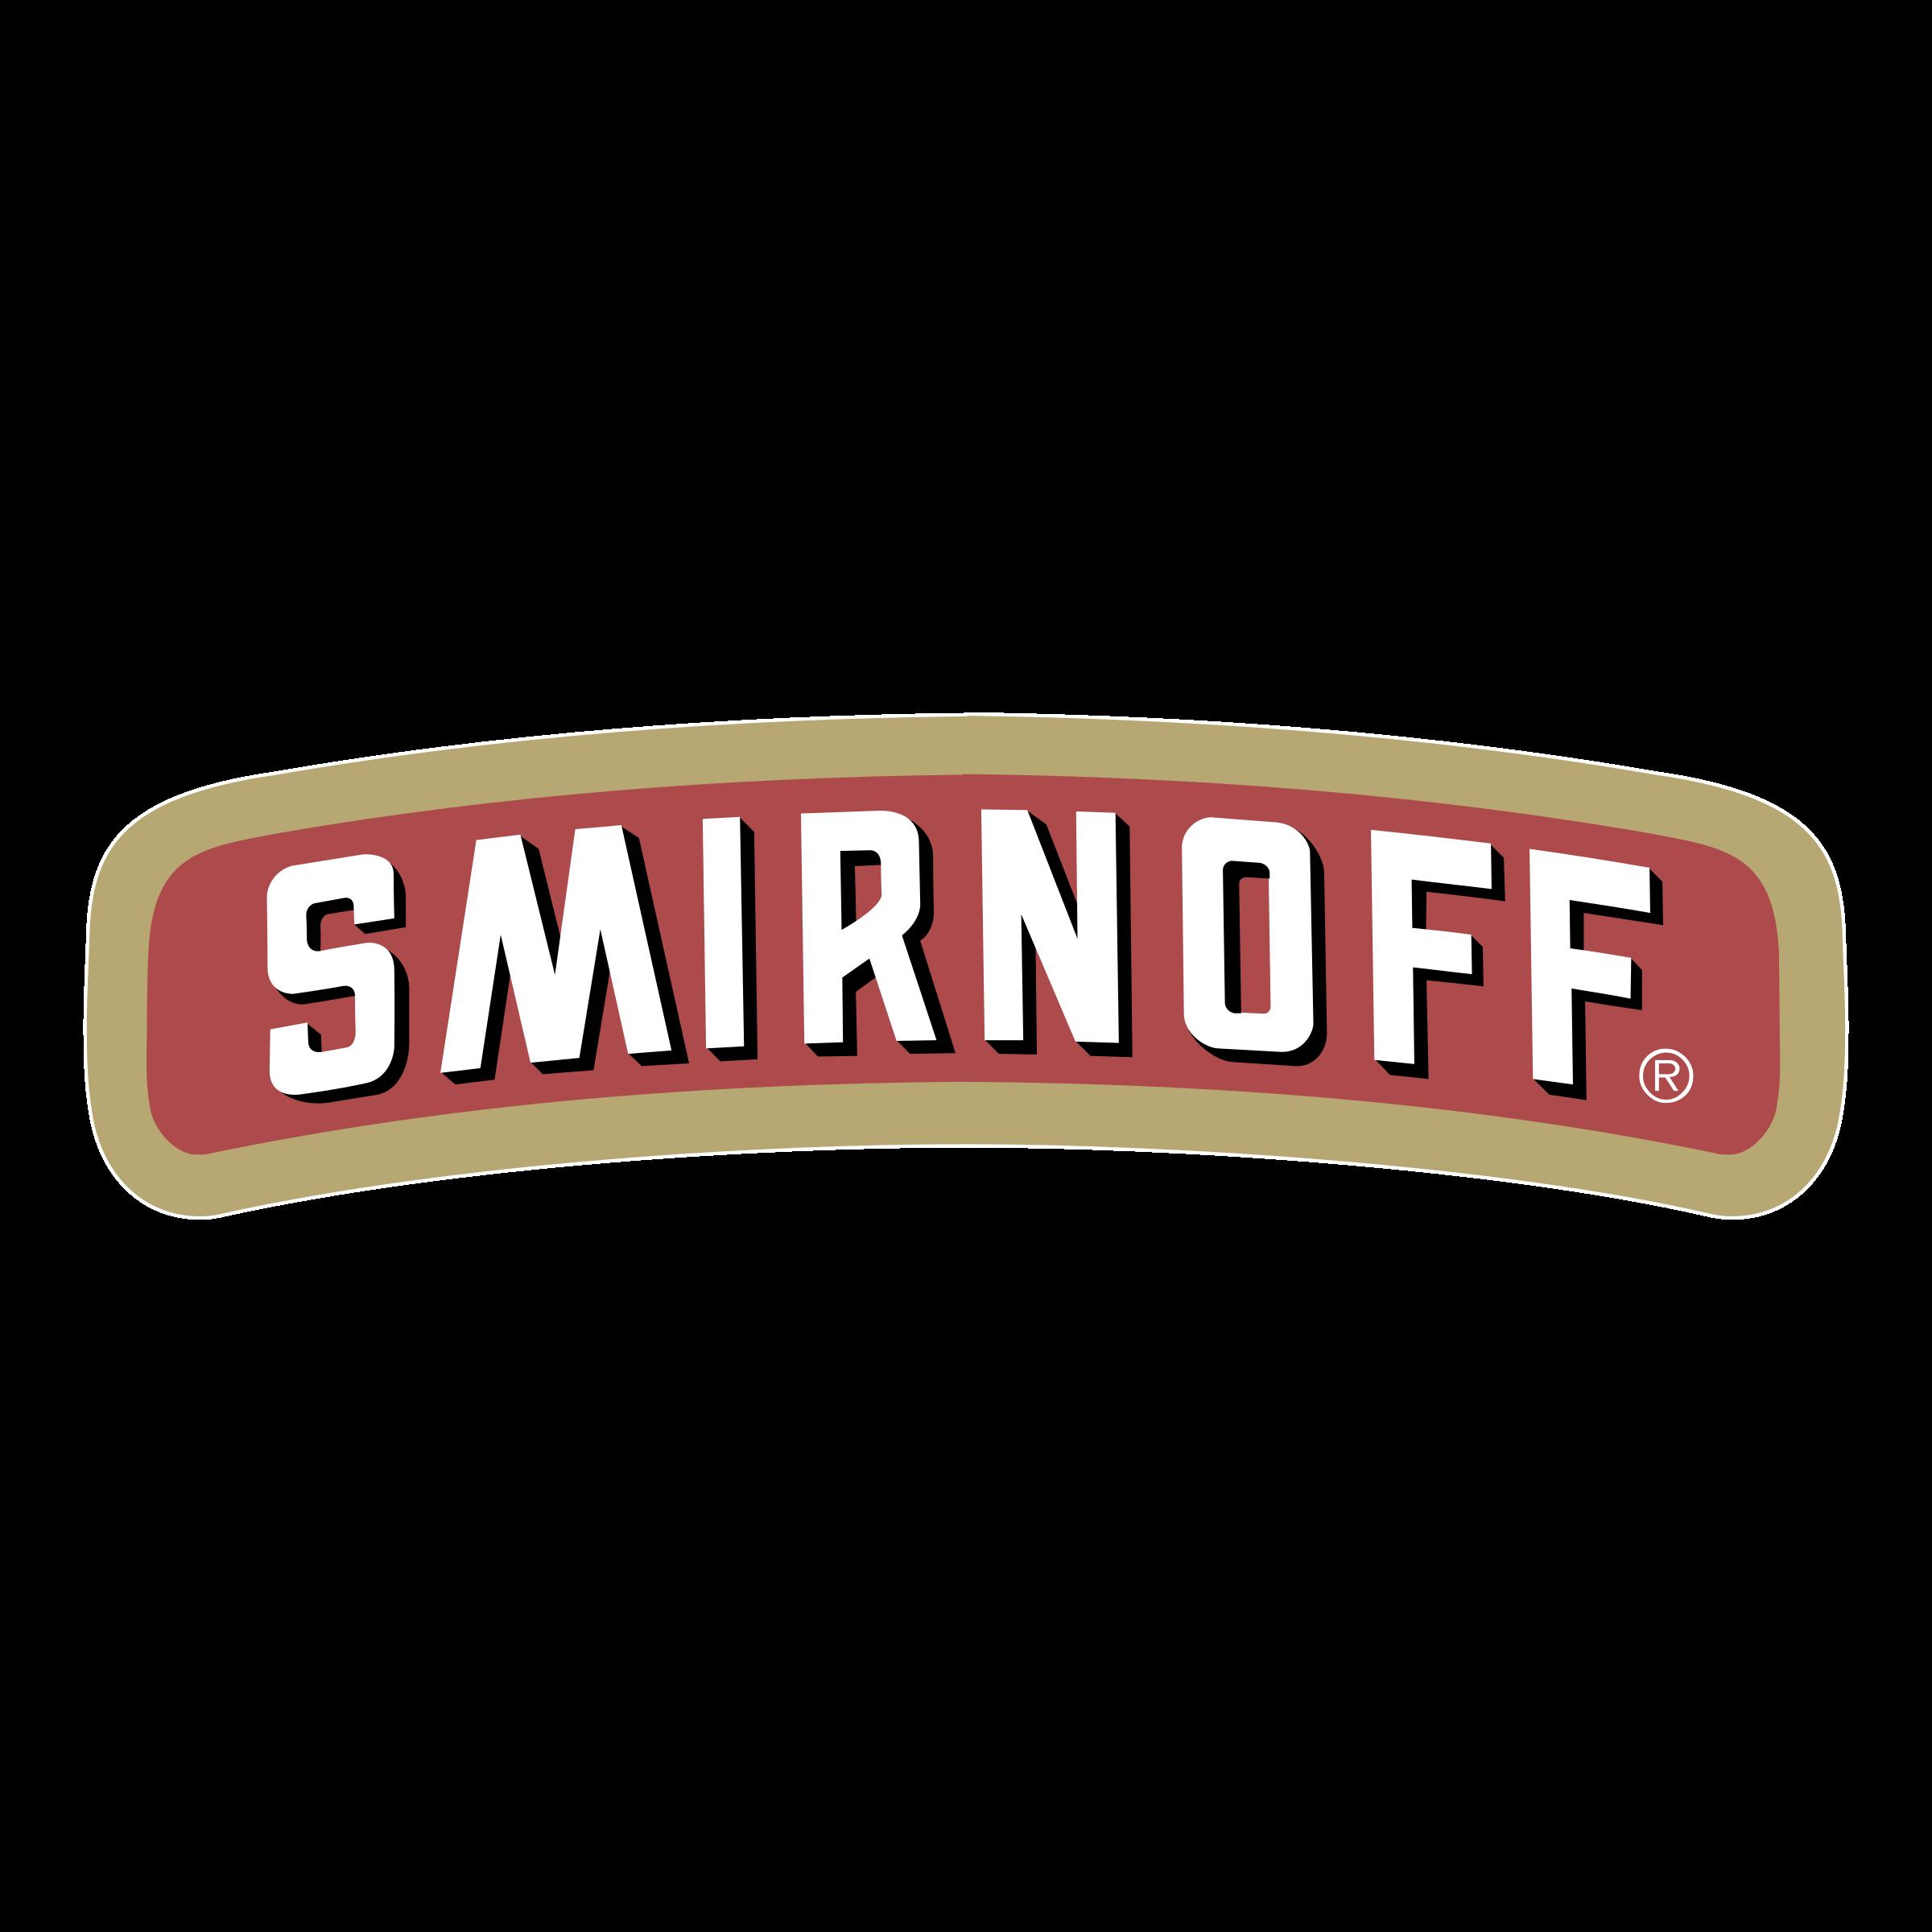 Smirnoff Logo Png & Free Smirnoff Logo.png Transparent.